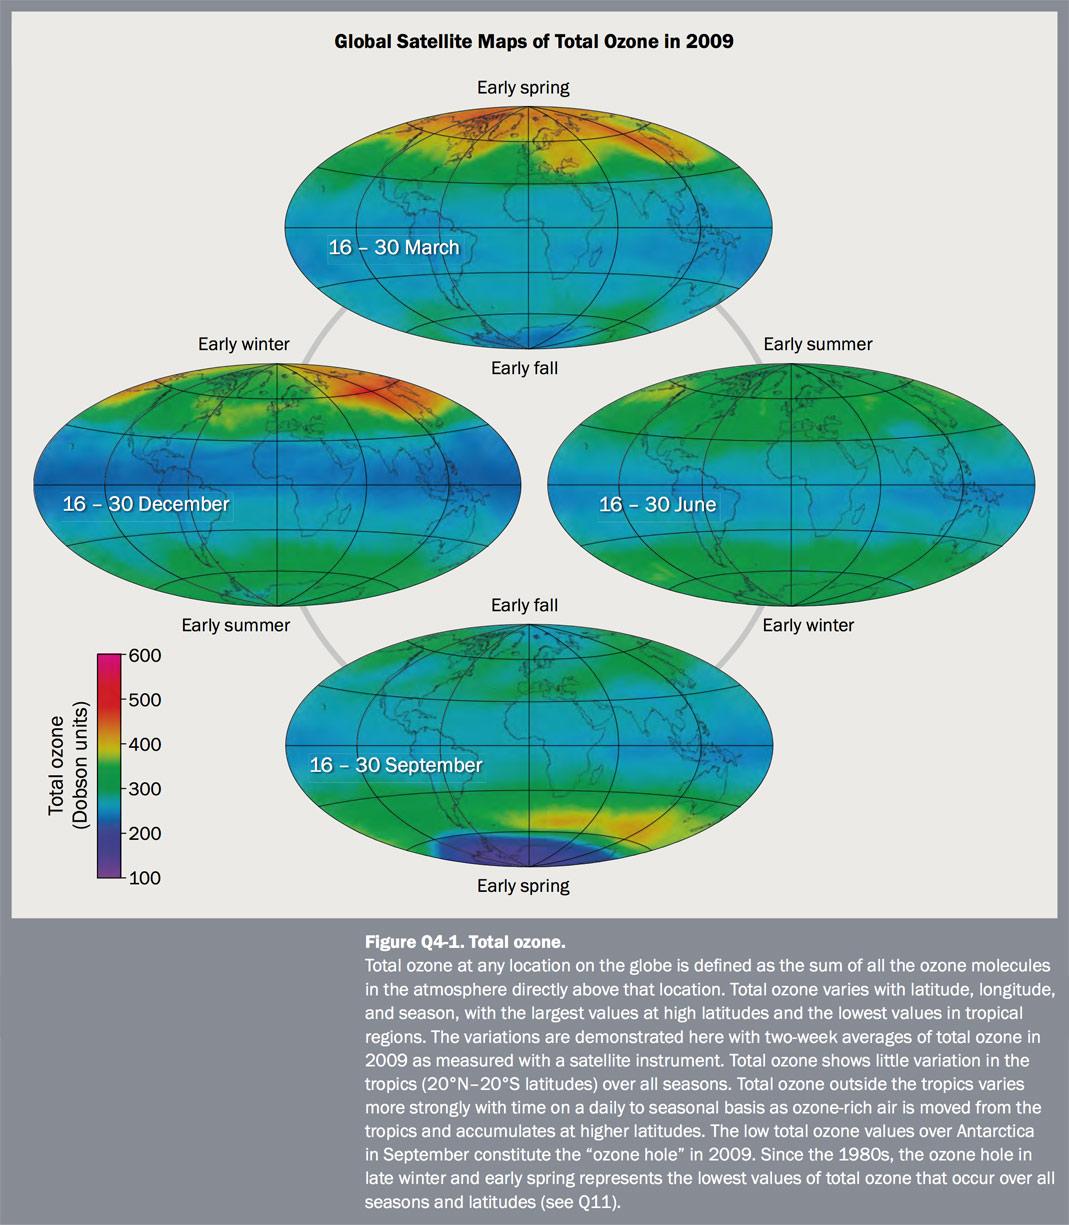 Figure Q4-1 Total ozone